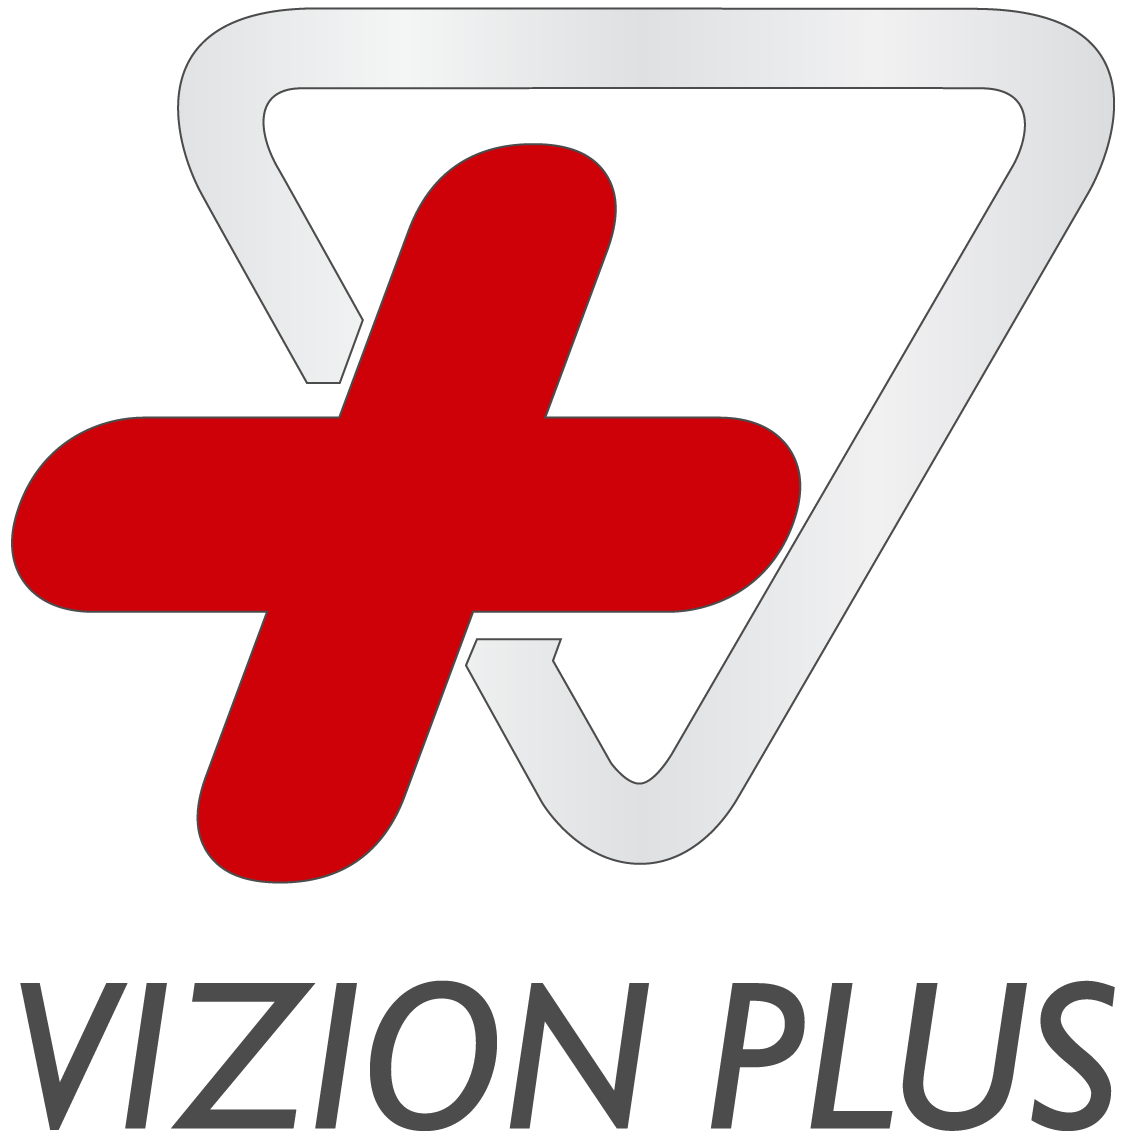 Vizion Plus